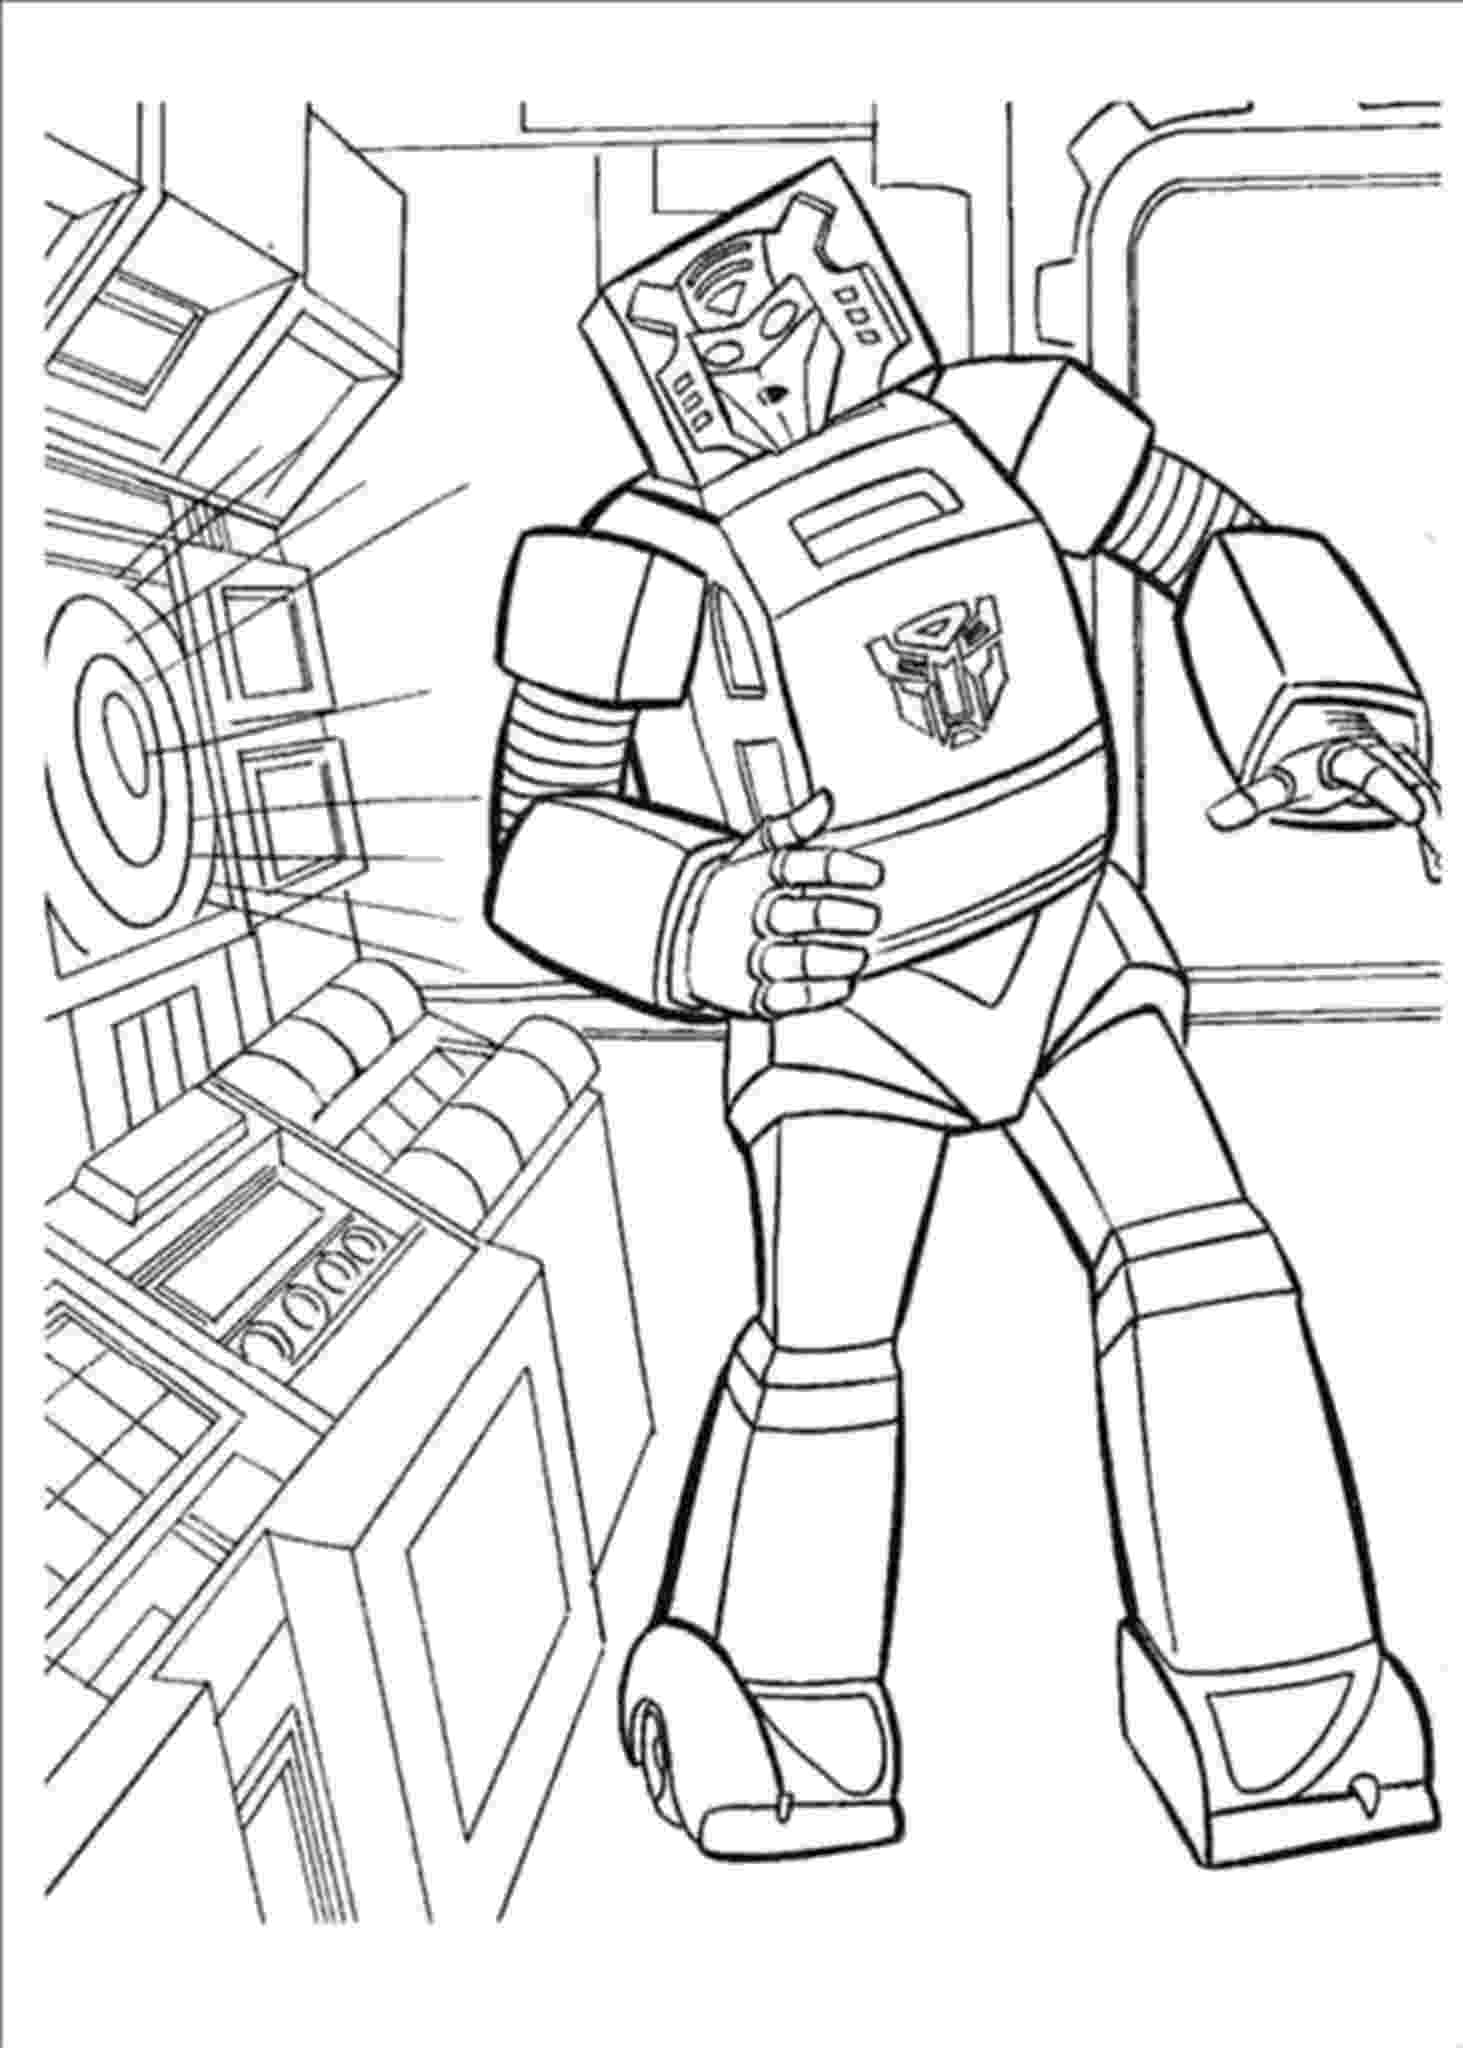 transformers coloring free printable transformers coloring pages for kids transformers coloring 1 3